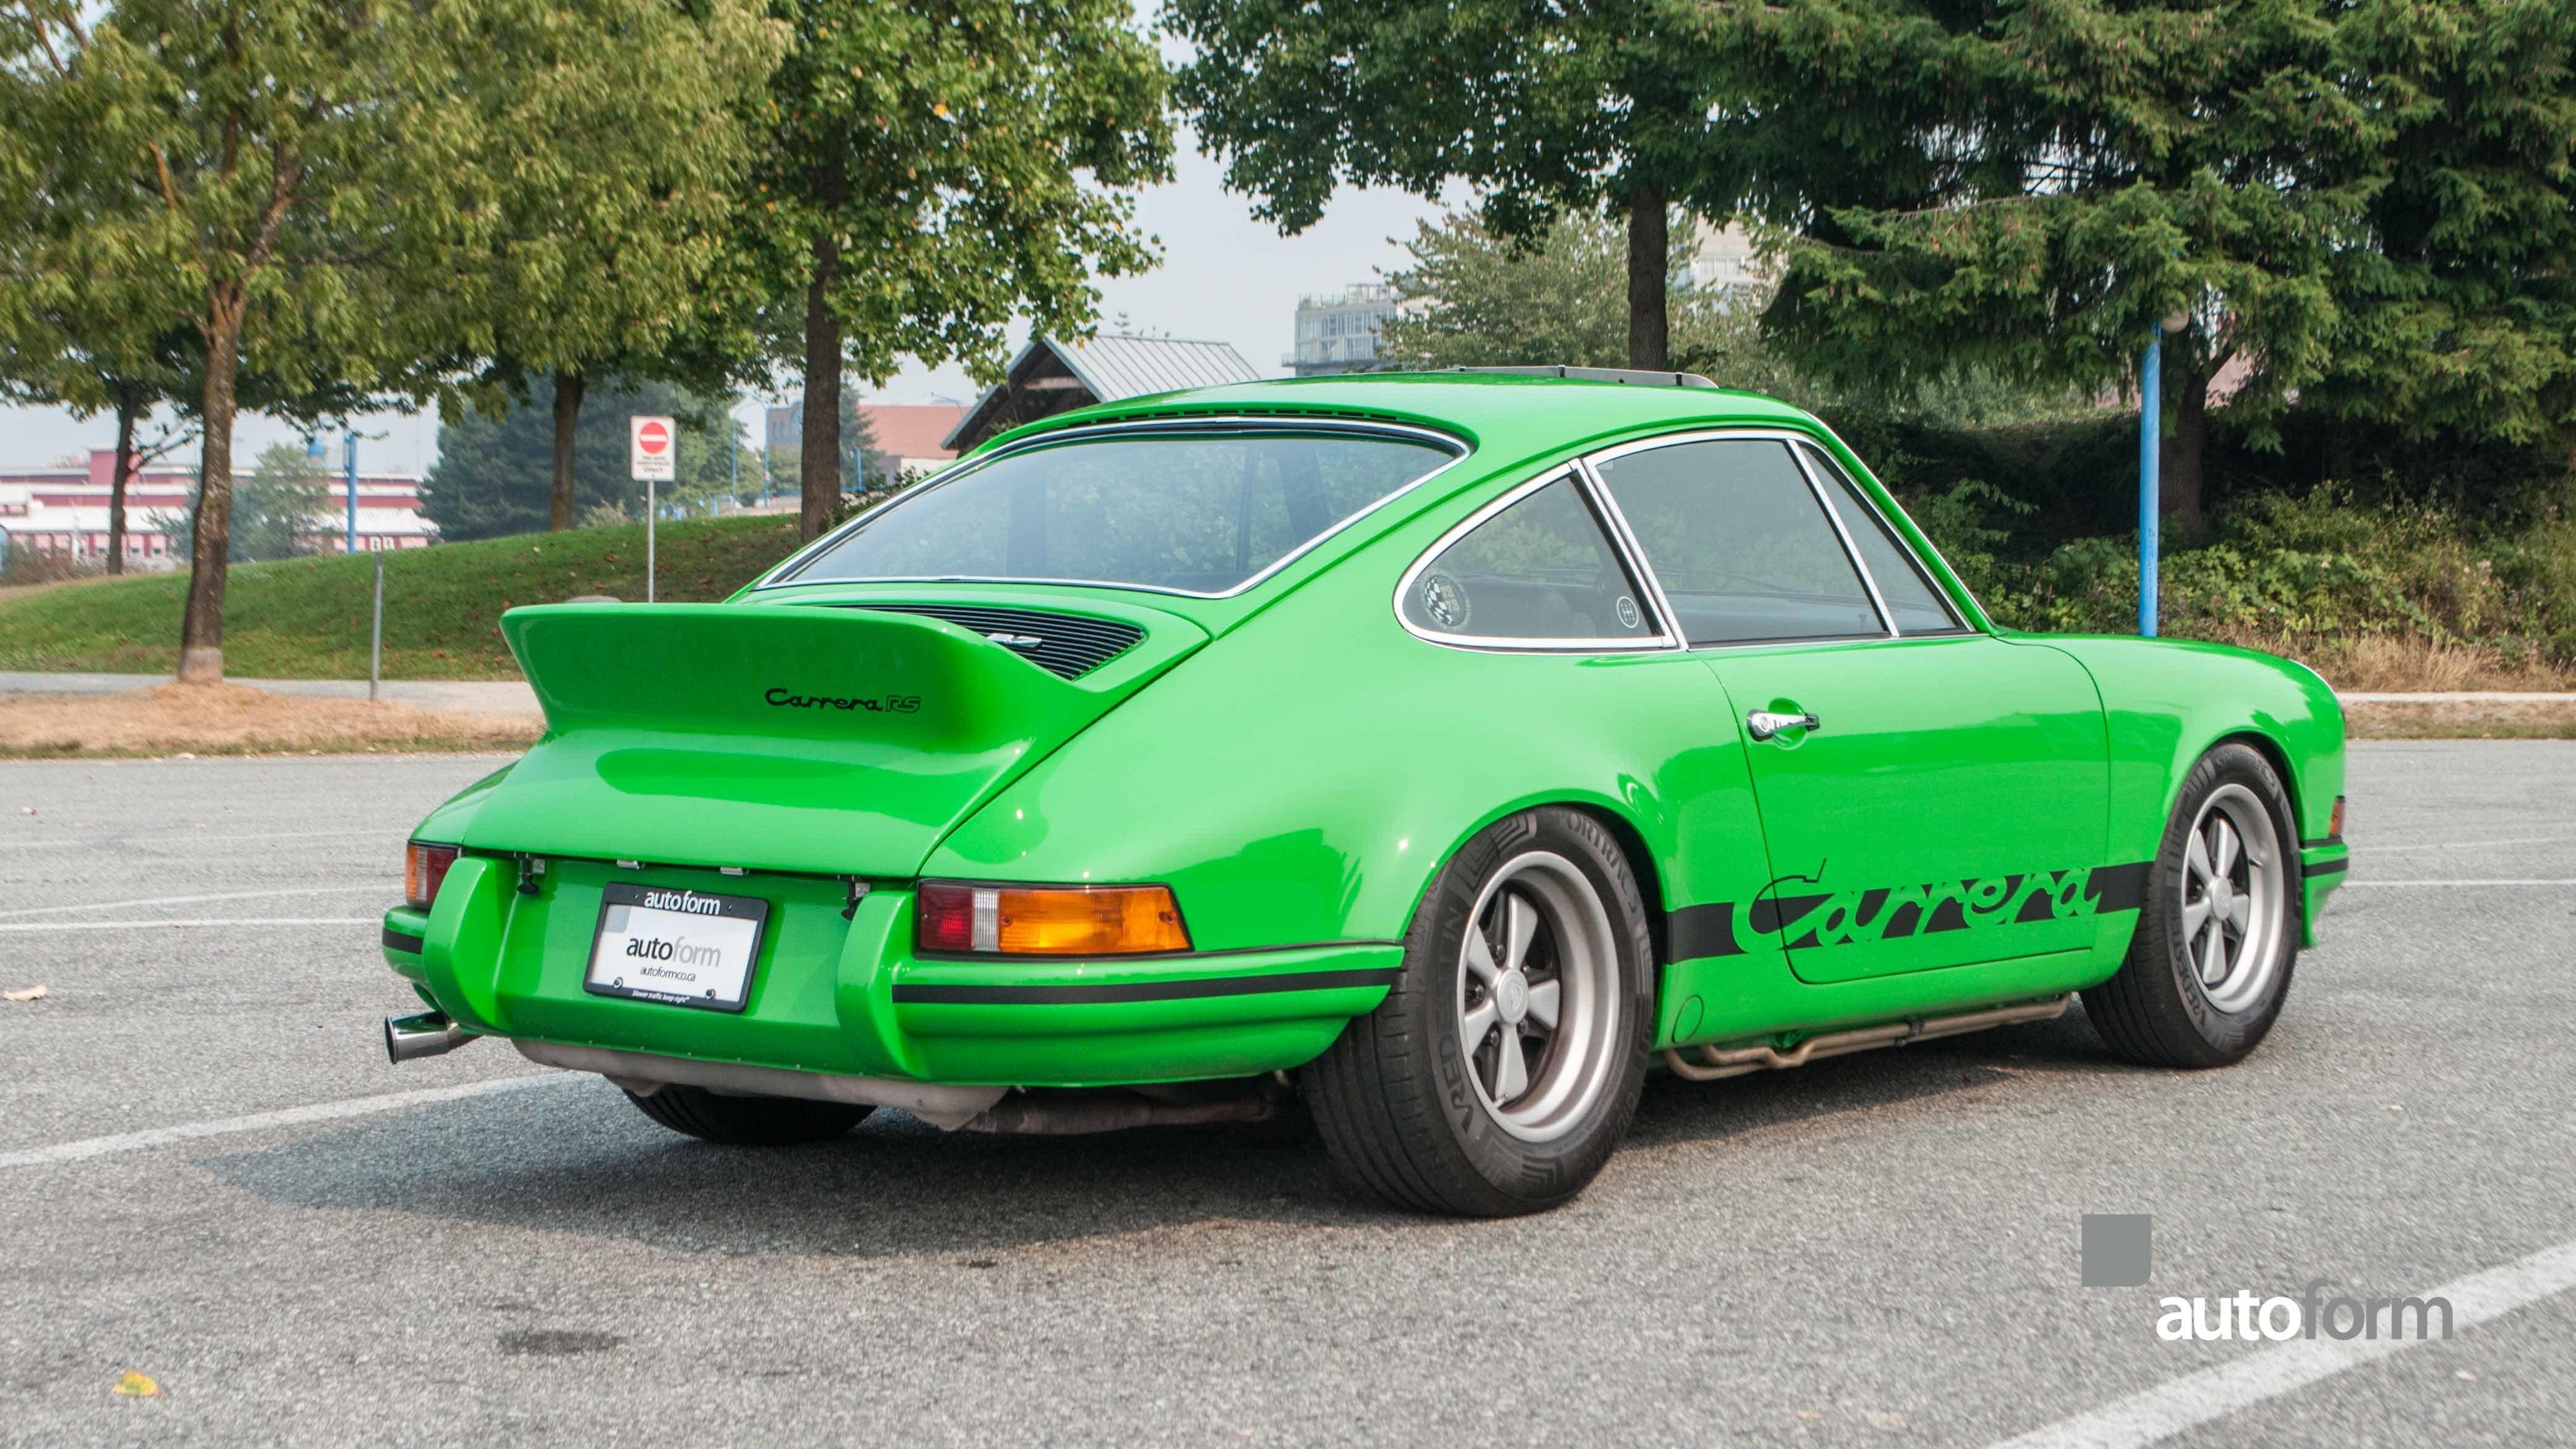 1980 Porsche 911 Carrera Rs Autoform